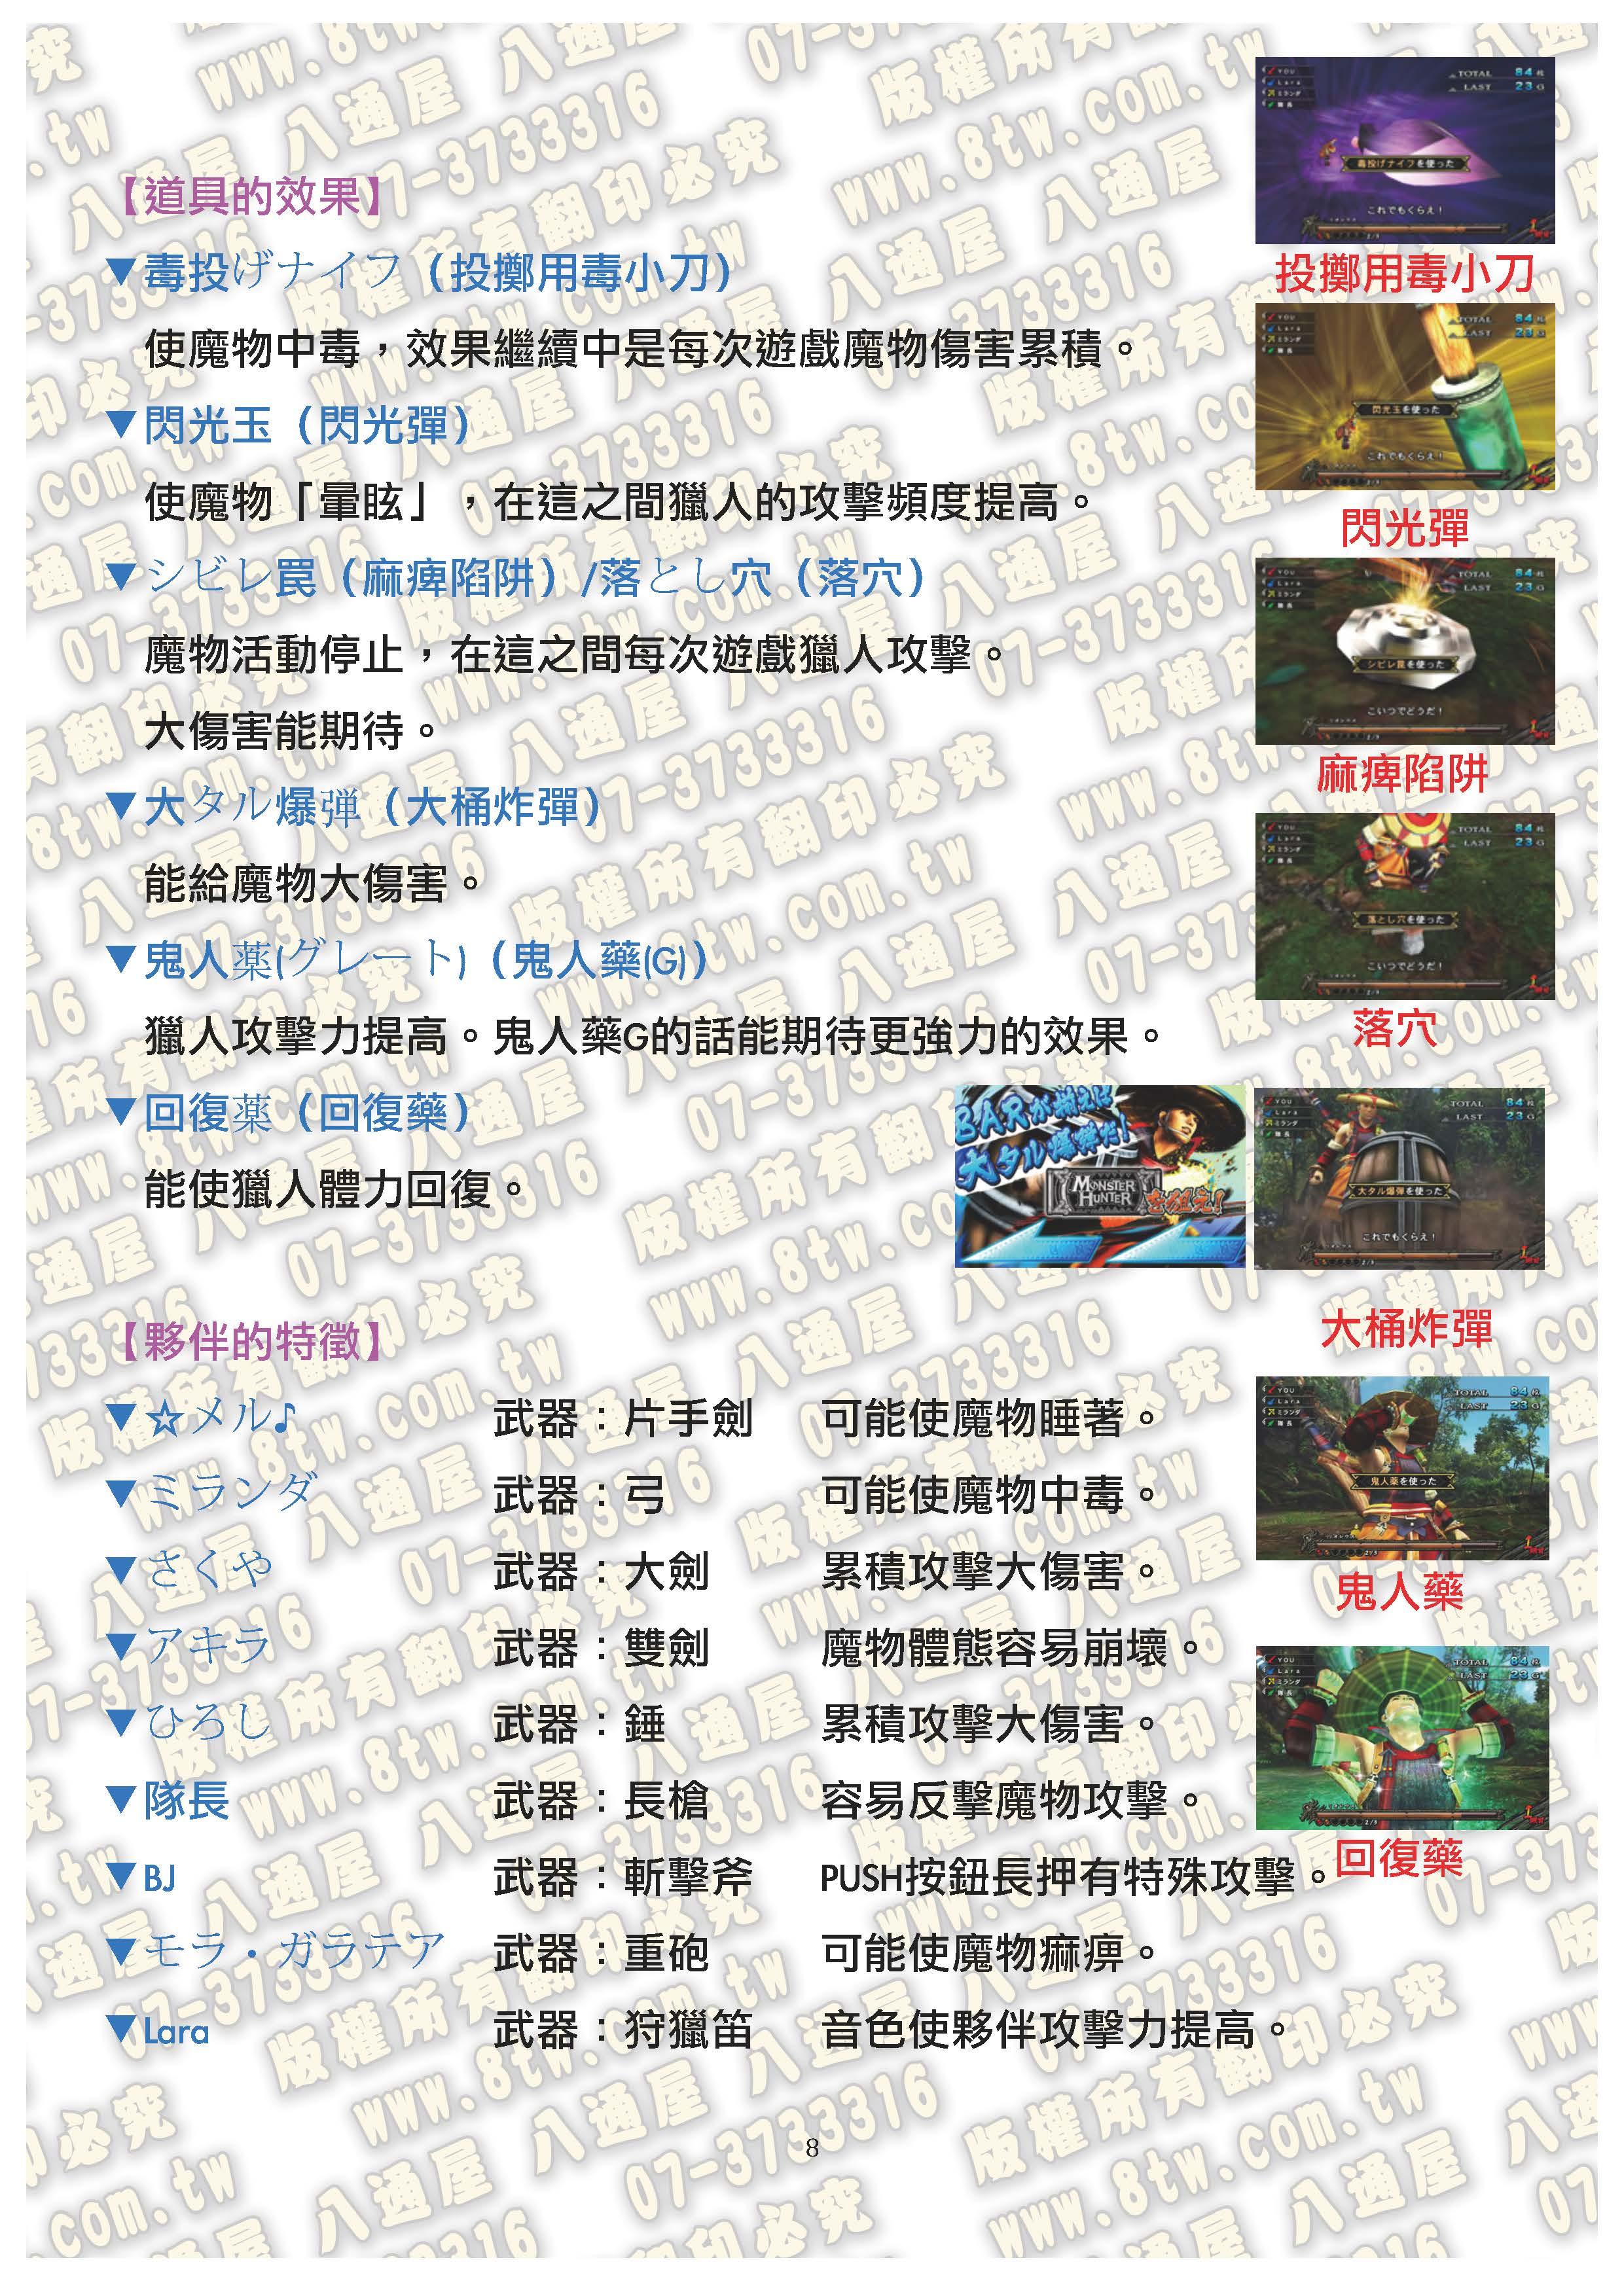 S0202魔物獵人 月下雷鳴 中文版攻略_Page_09